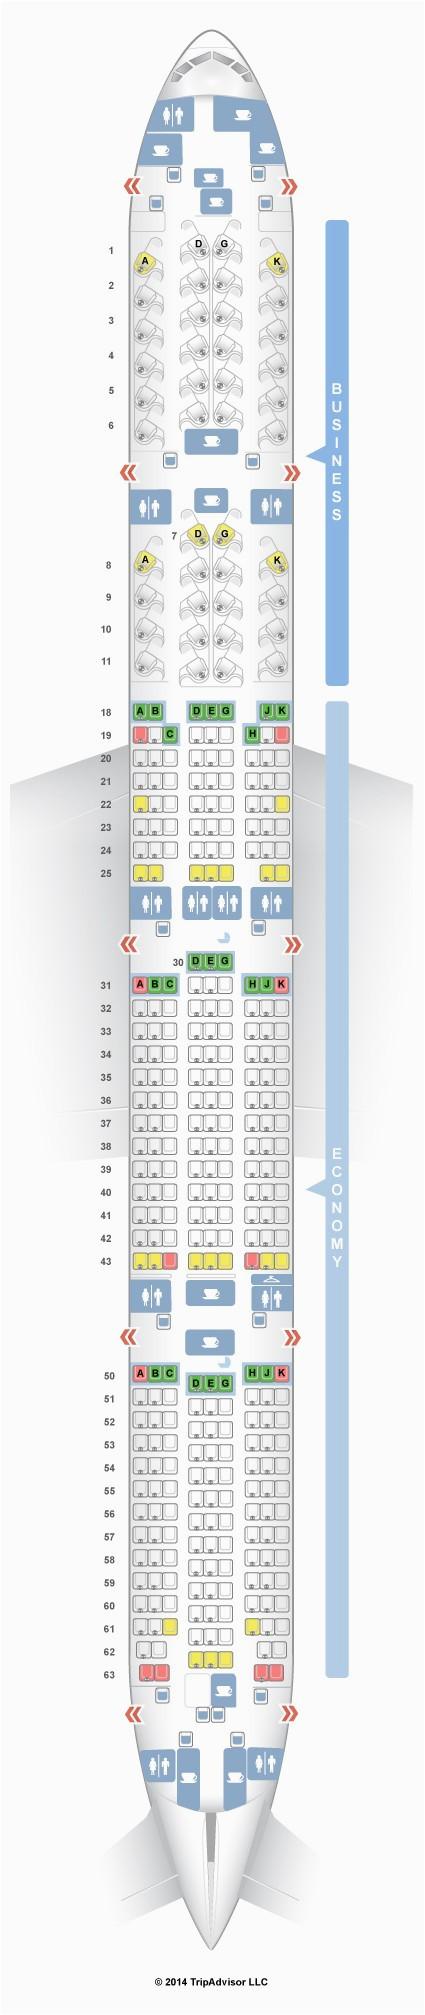 77w seat map seatguru air canada boeing 777 300er 77w two class